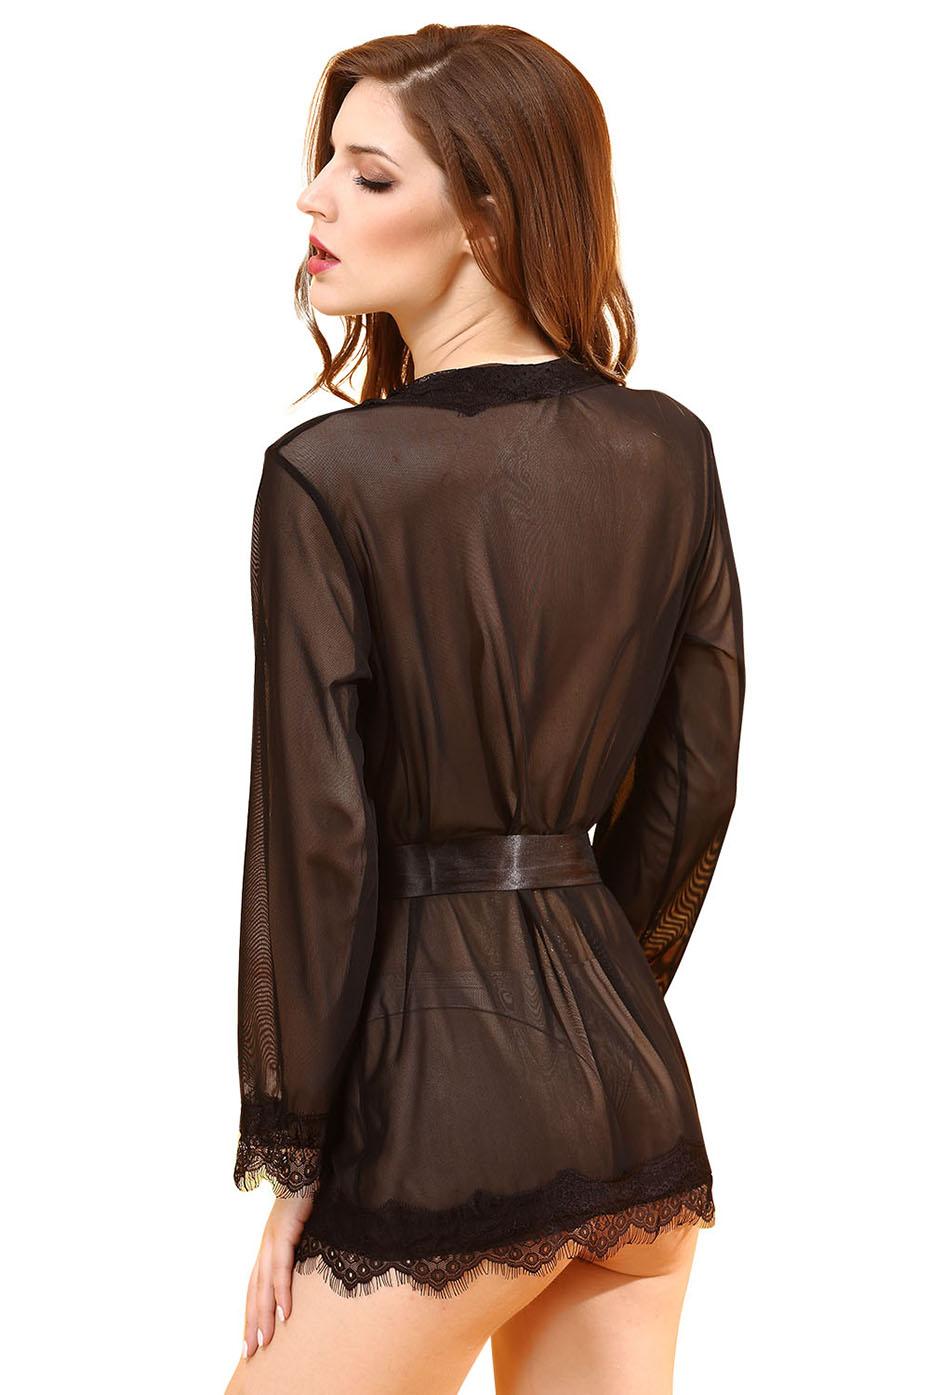 530202450c SusanDick 2018 Women Sleepwear Silk Robe   Gown Set Luxury China Satin Robe  Nightwear Lady Spring Autumn Sexy Bothrobe PyjamasUSD 19.50 set